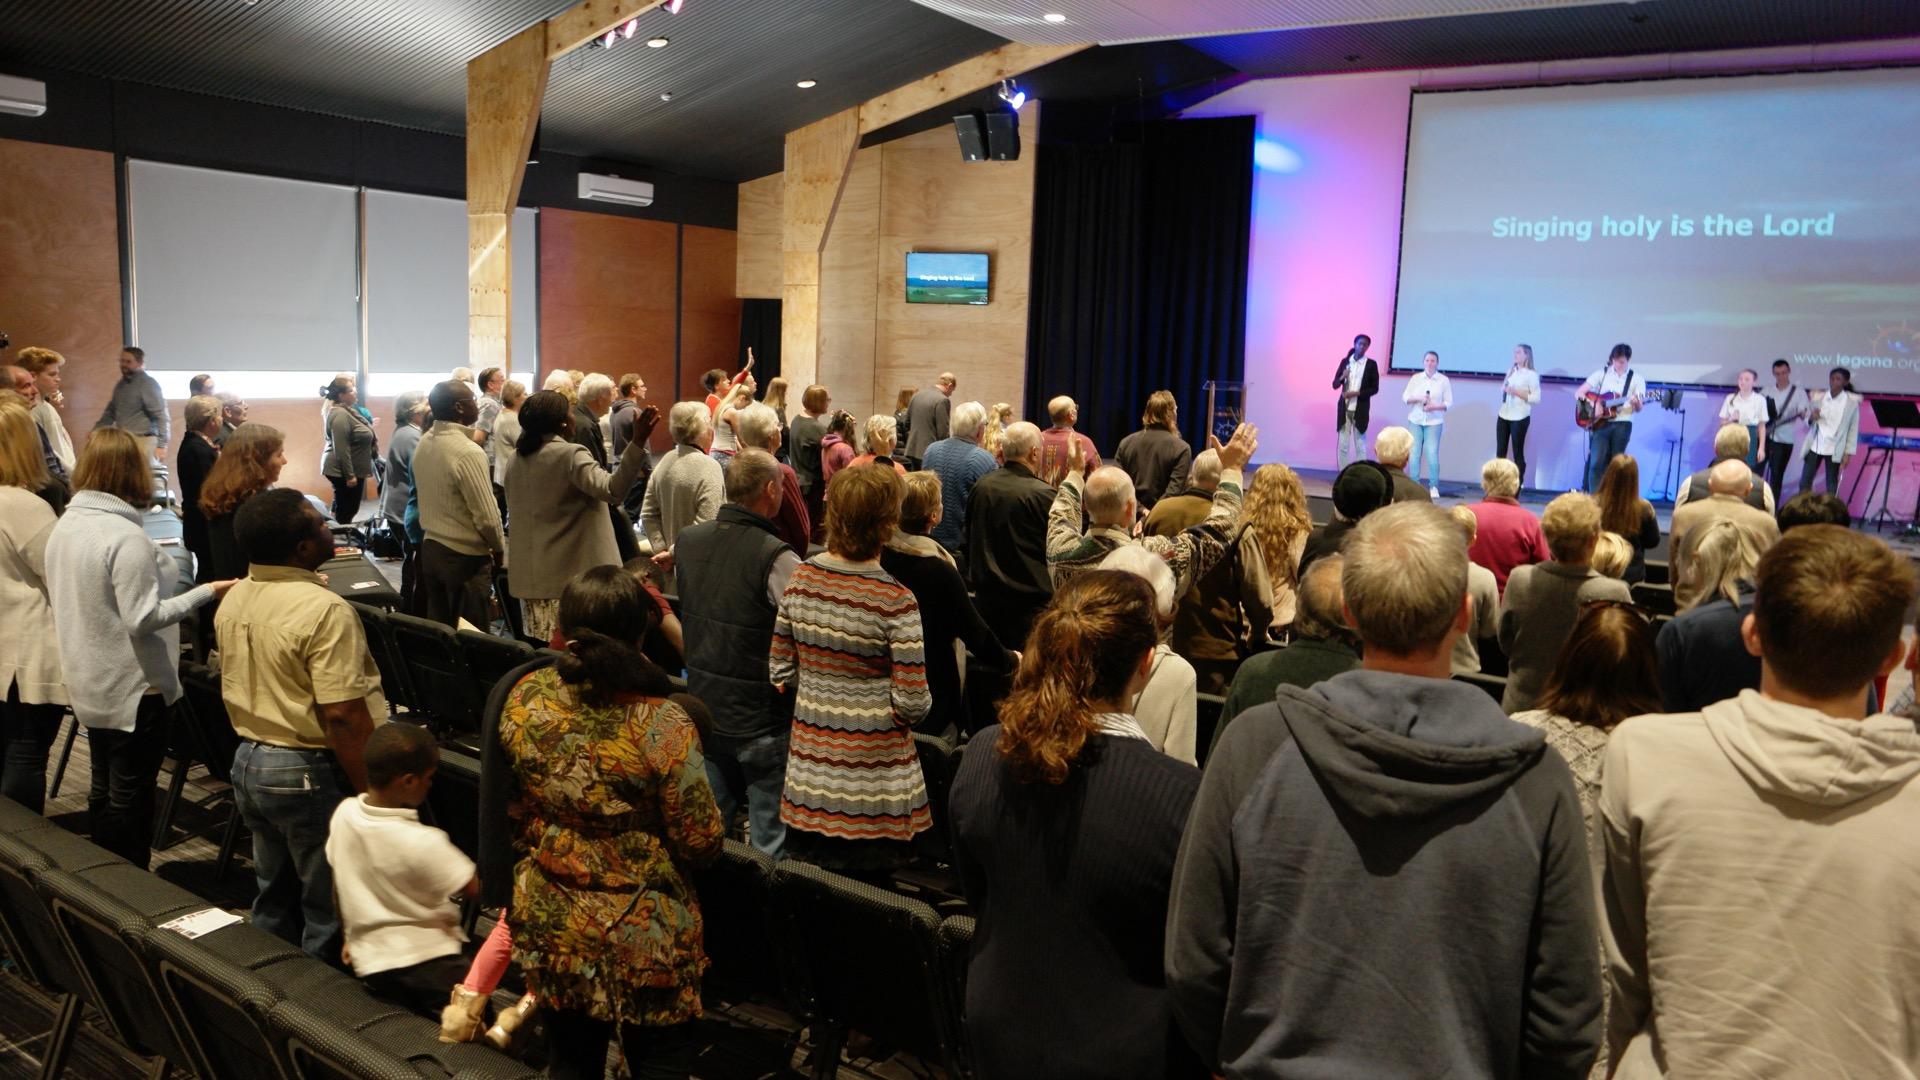 Pentecostal Worship - finding truth matters